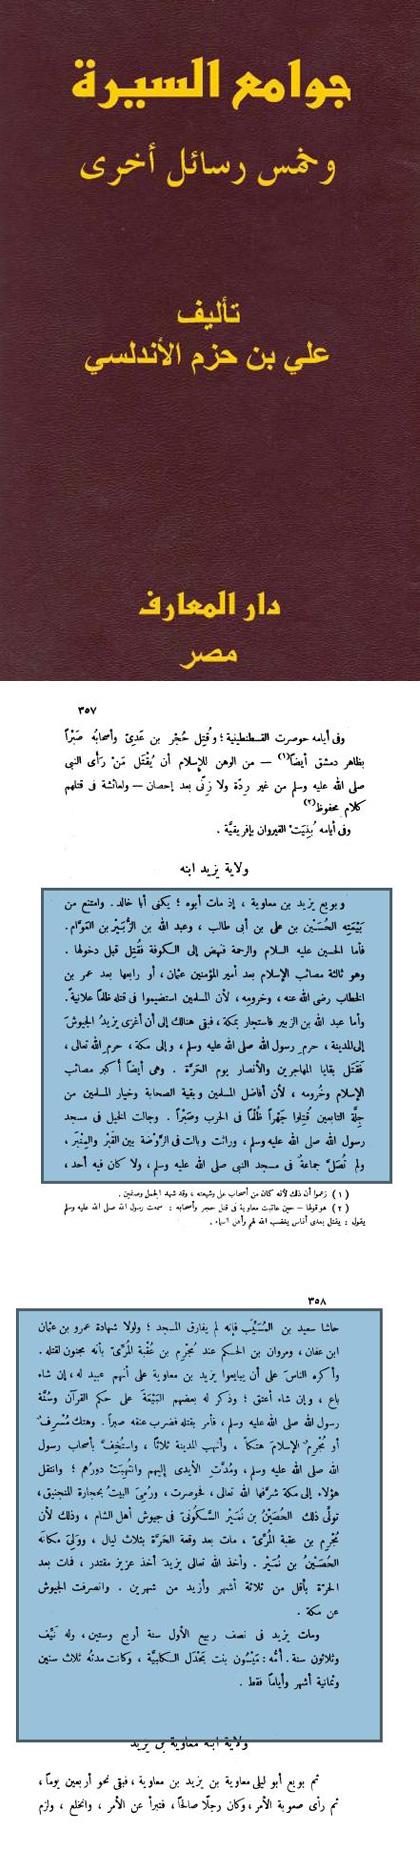 jawame_al_Sirah_p357_358